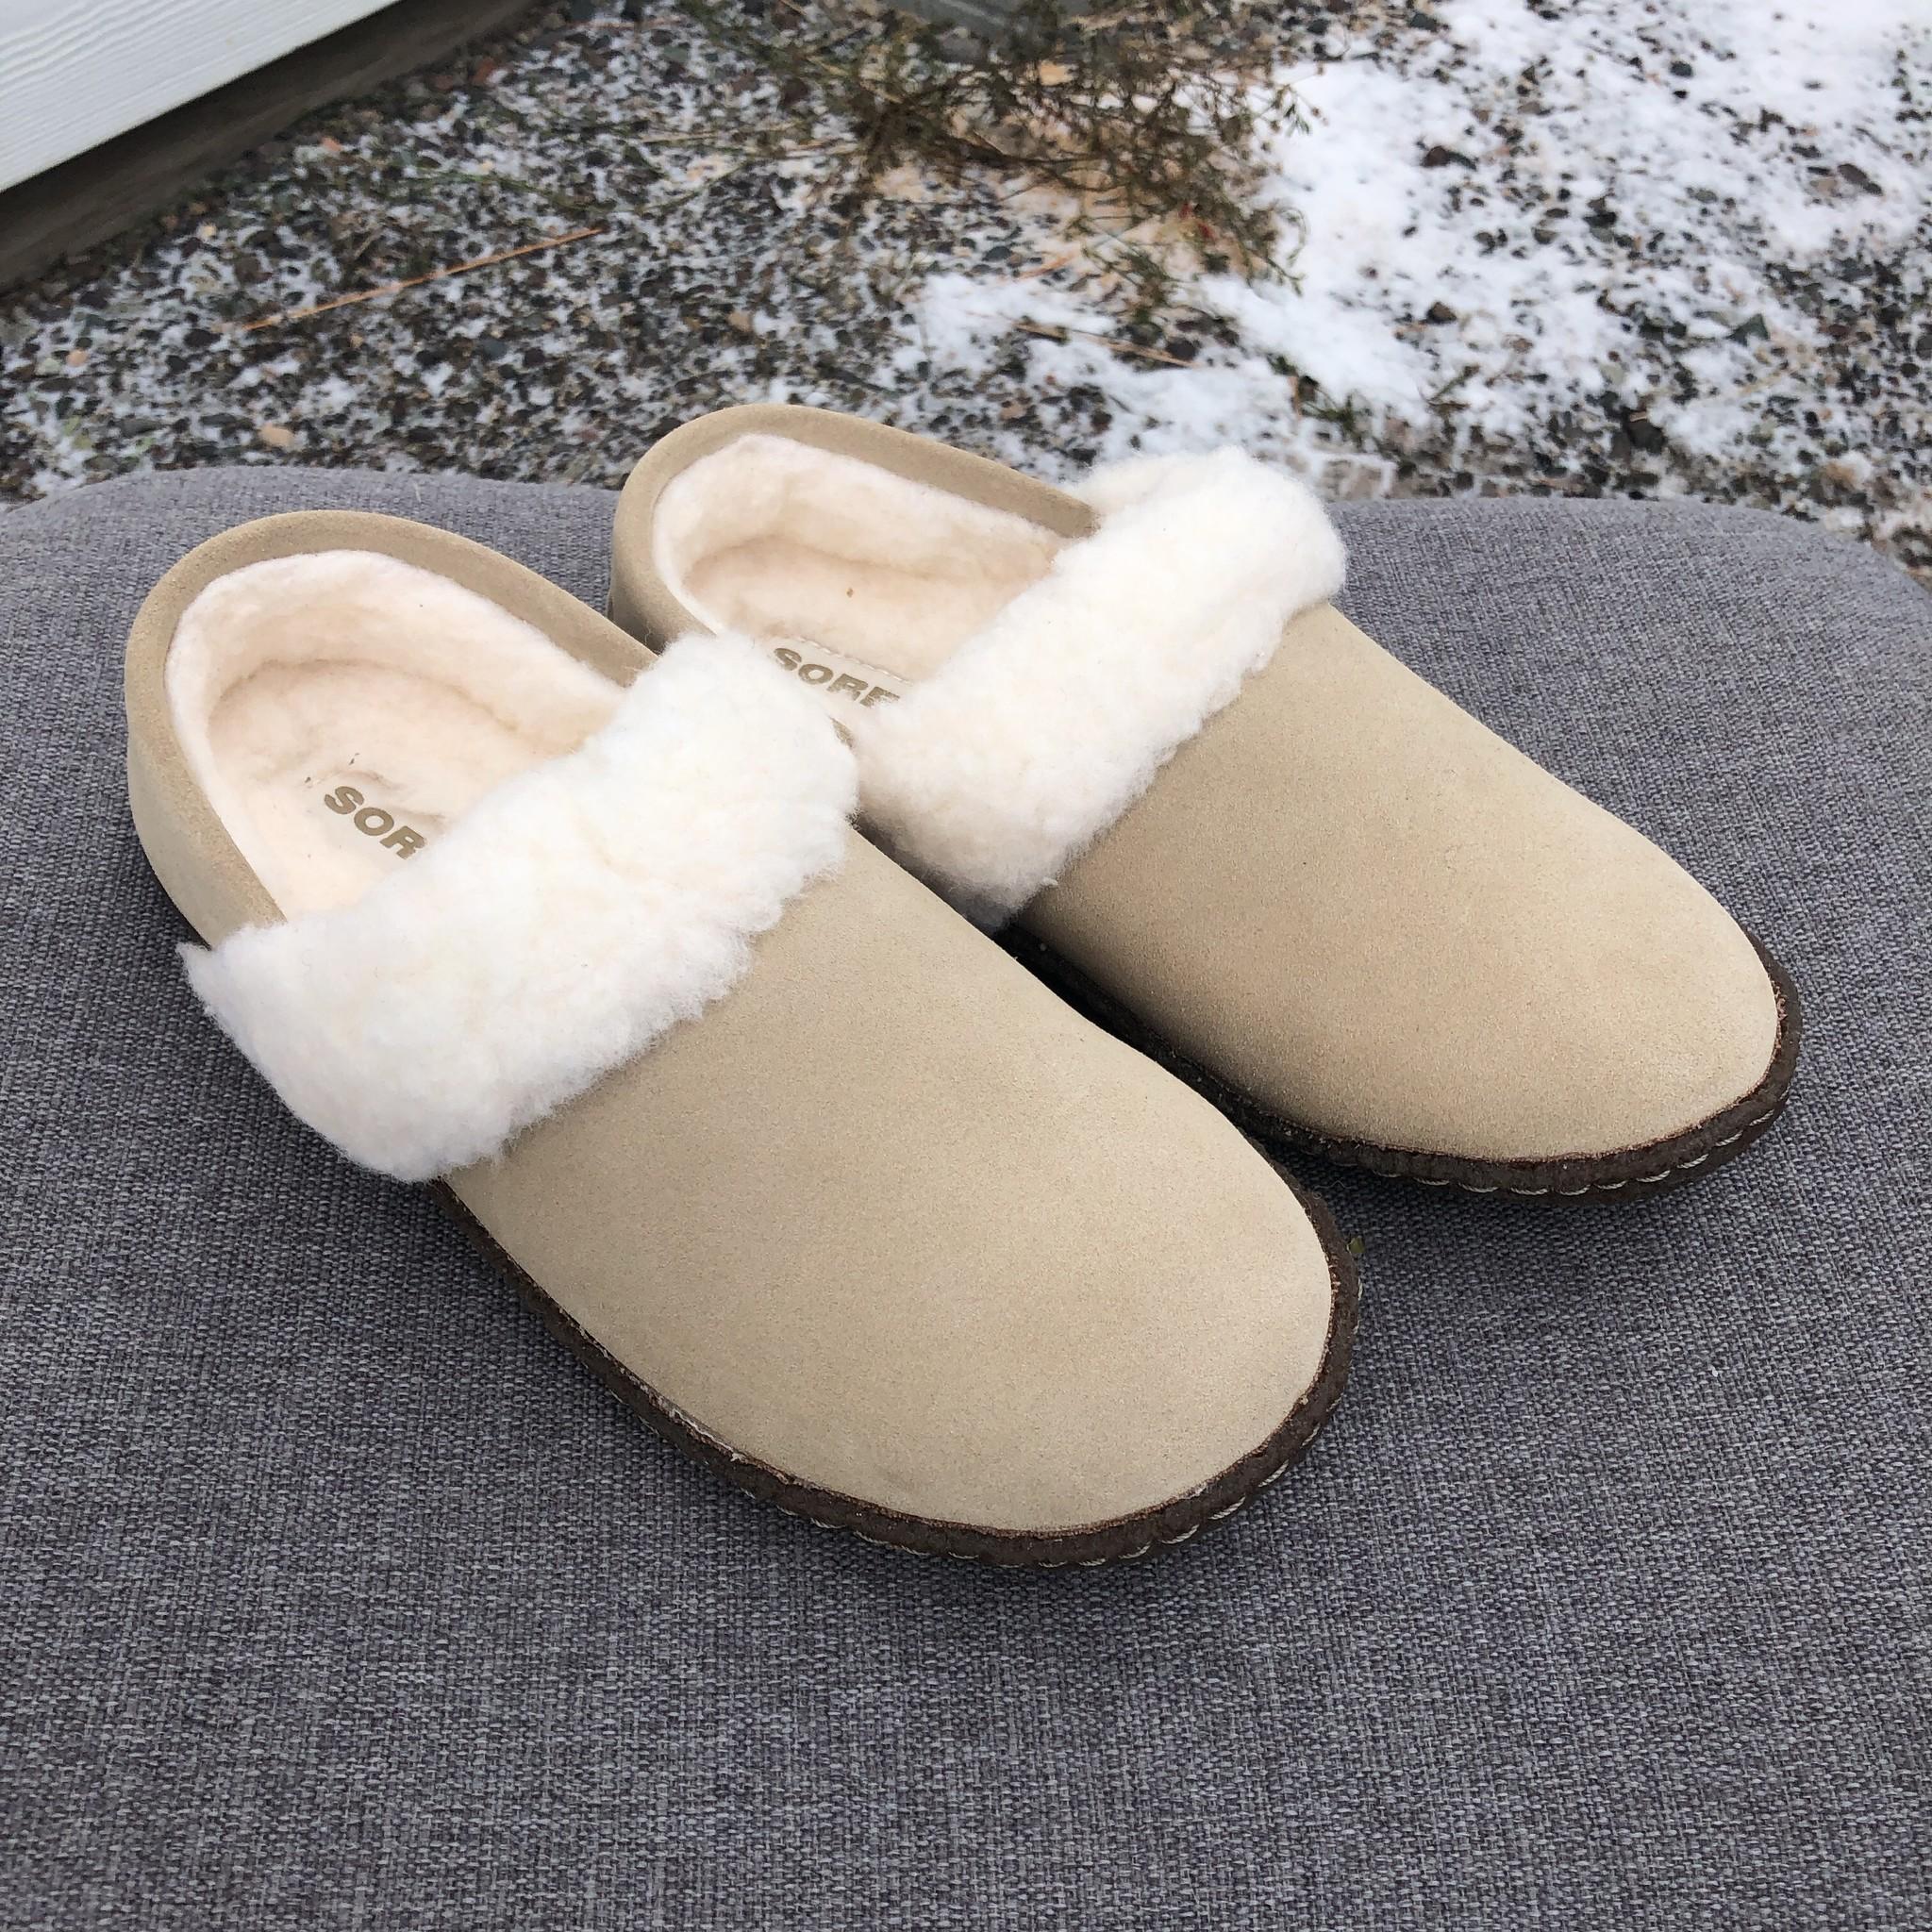 Sorel Footwear Nakiska Slipper II Tan